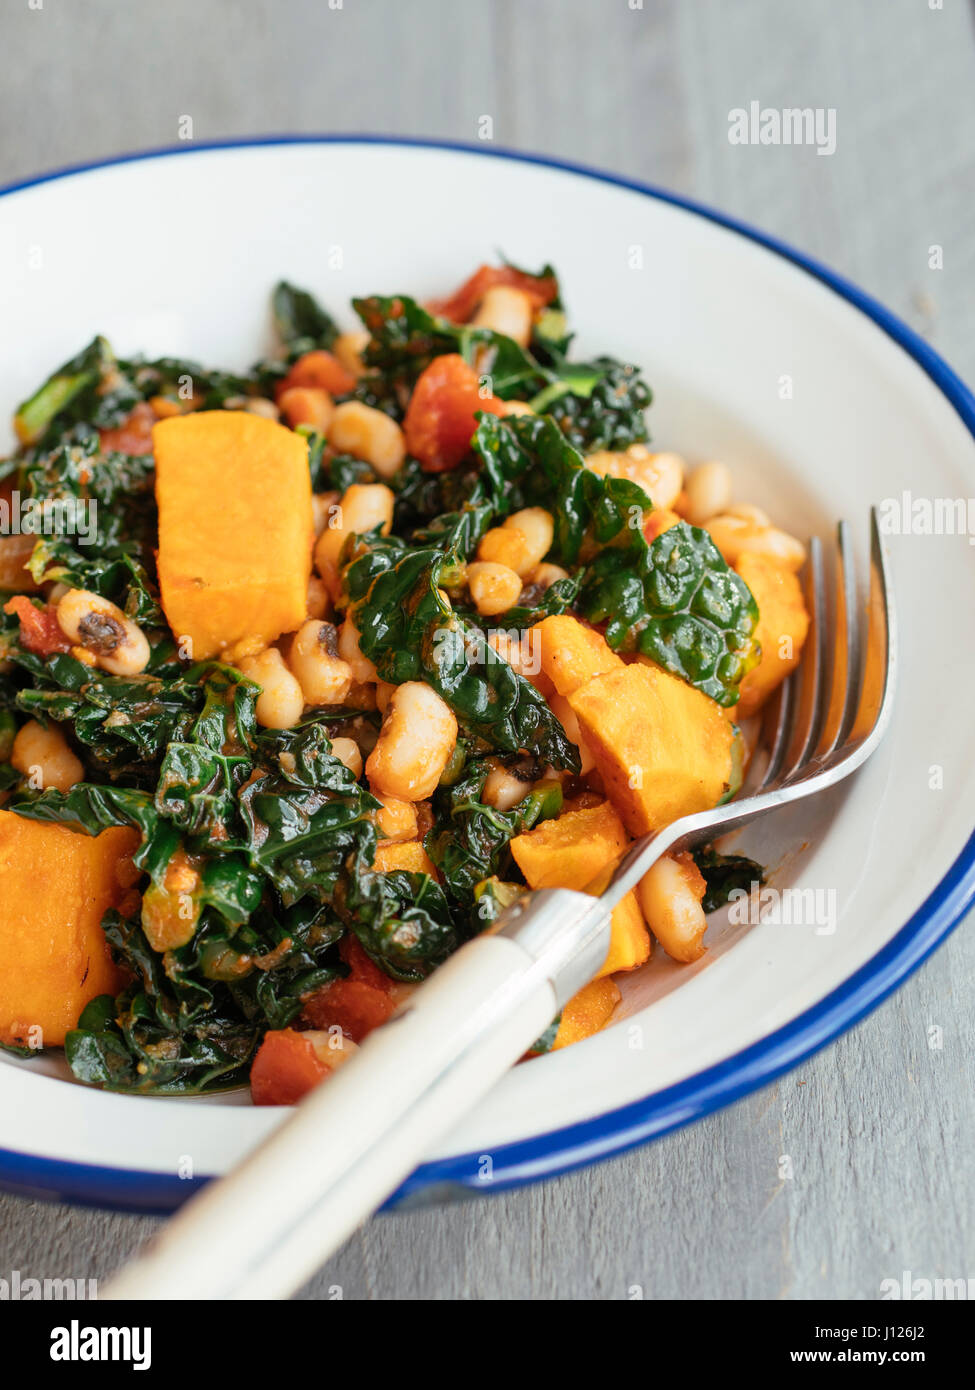 Black-eyed Peas, Sweet Potatoes and Kale - Stock Image